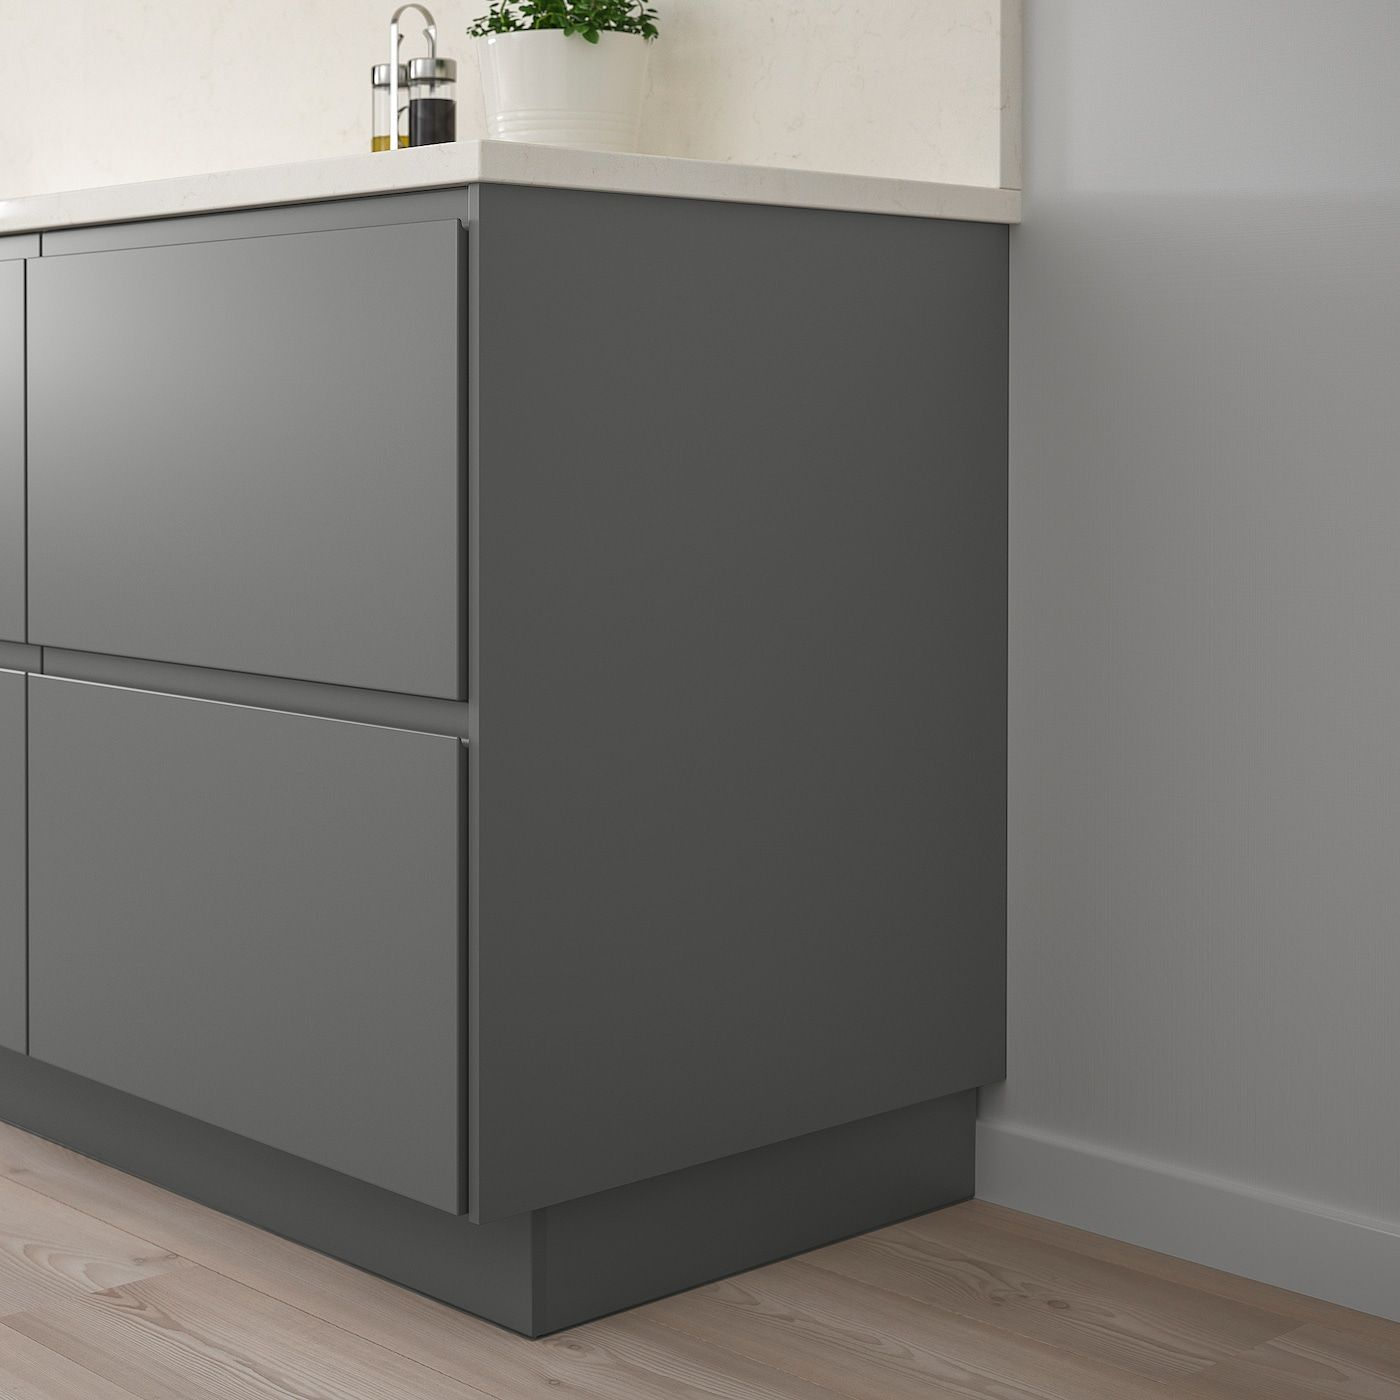 Forbattra Cover Panel Dark Gray Canada En Ikea Ikea Countertop Organization Dark Grey Kitchen